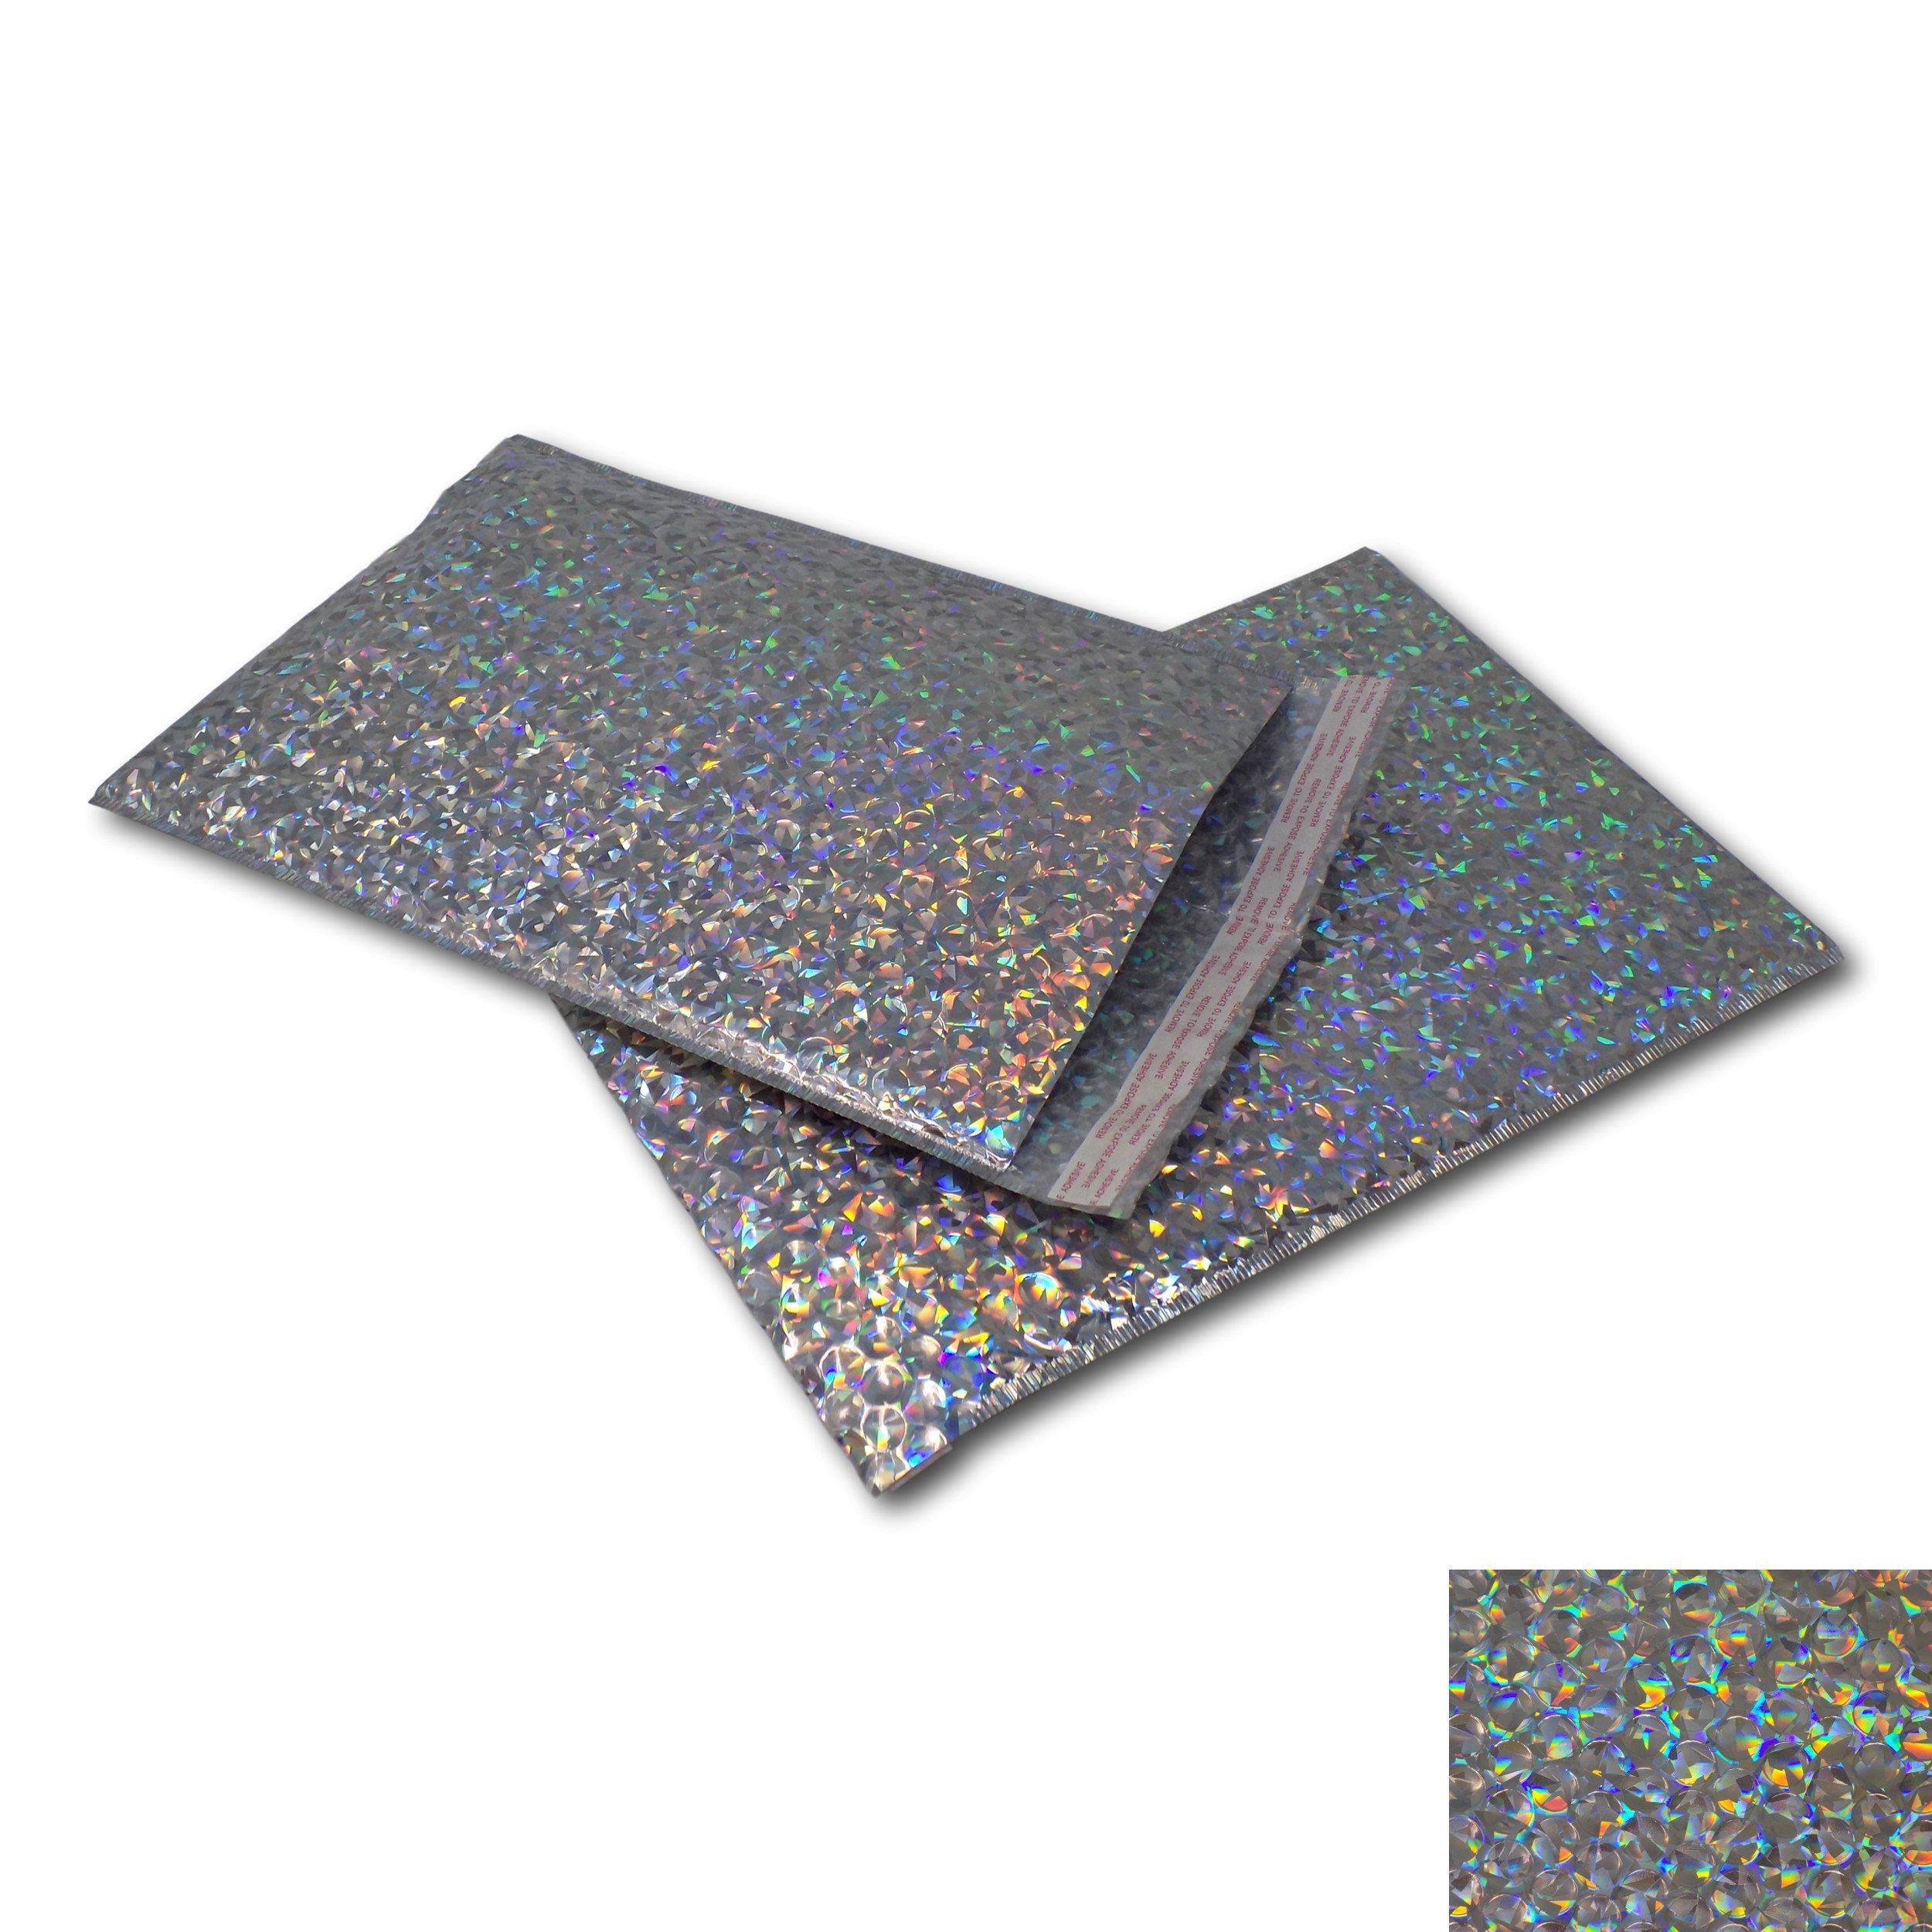 5 Hot Pink 165mm x 165mm CD Shiny Metallic Bubble Padded Bag Mailing Envelopes